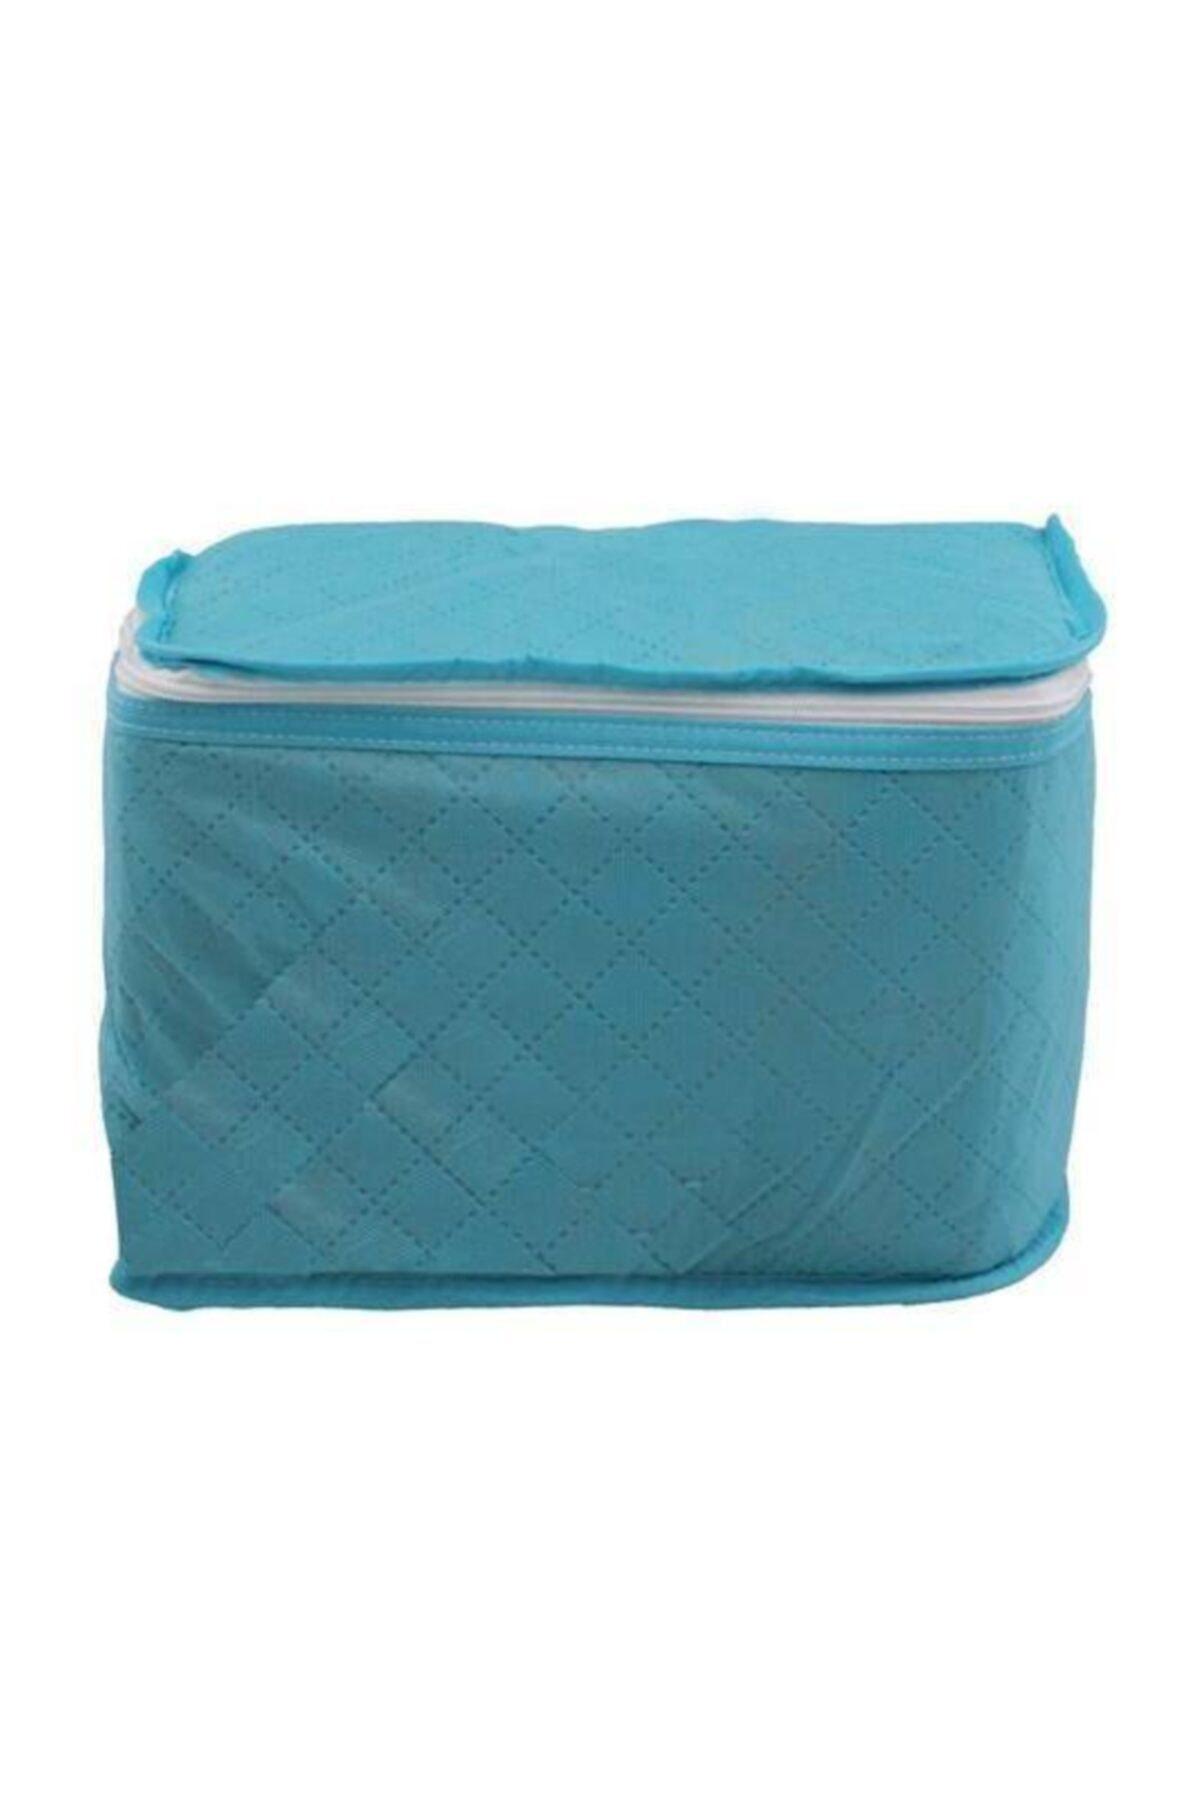 Simisso Çorap Hurcu 30x20x20 Cm | Mavi 1